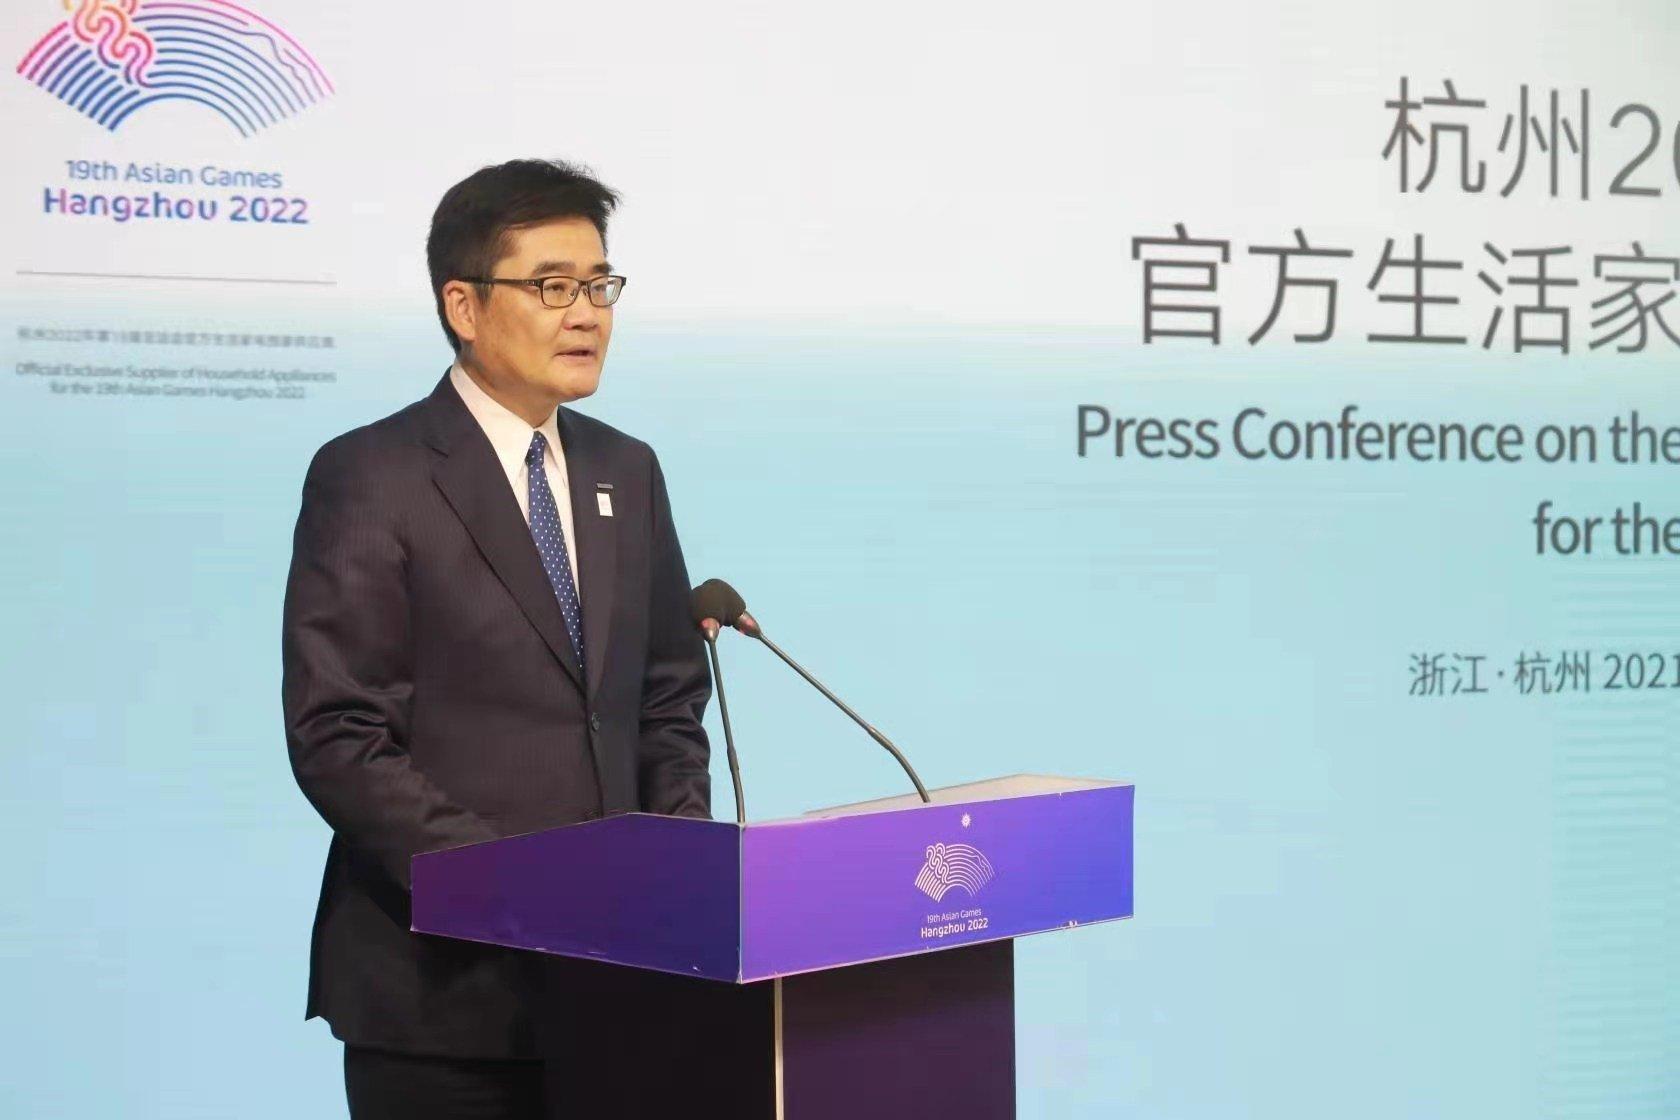 Photo: Homma Tetsuro, Representative Director of Panasonic Corporation and Chairman of Panasonic Corporation of China